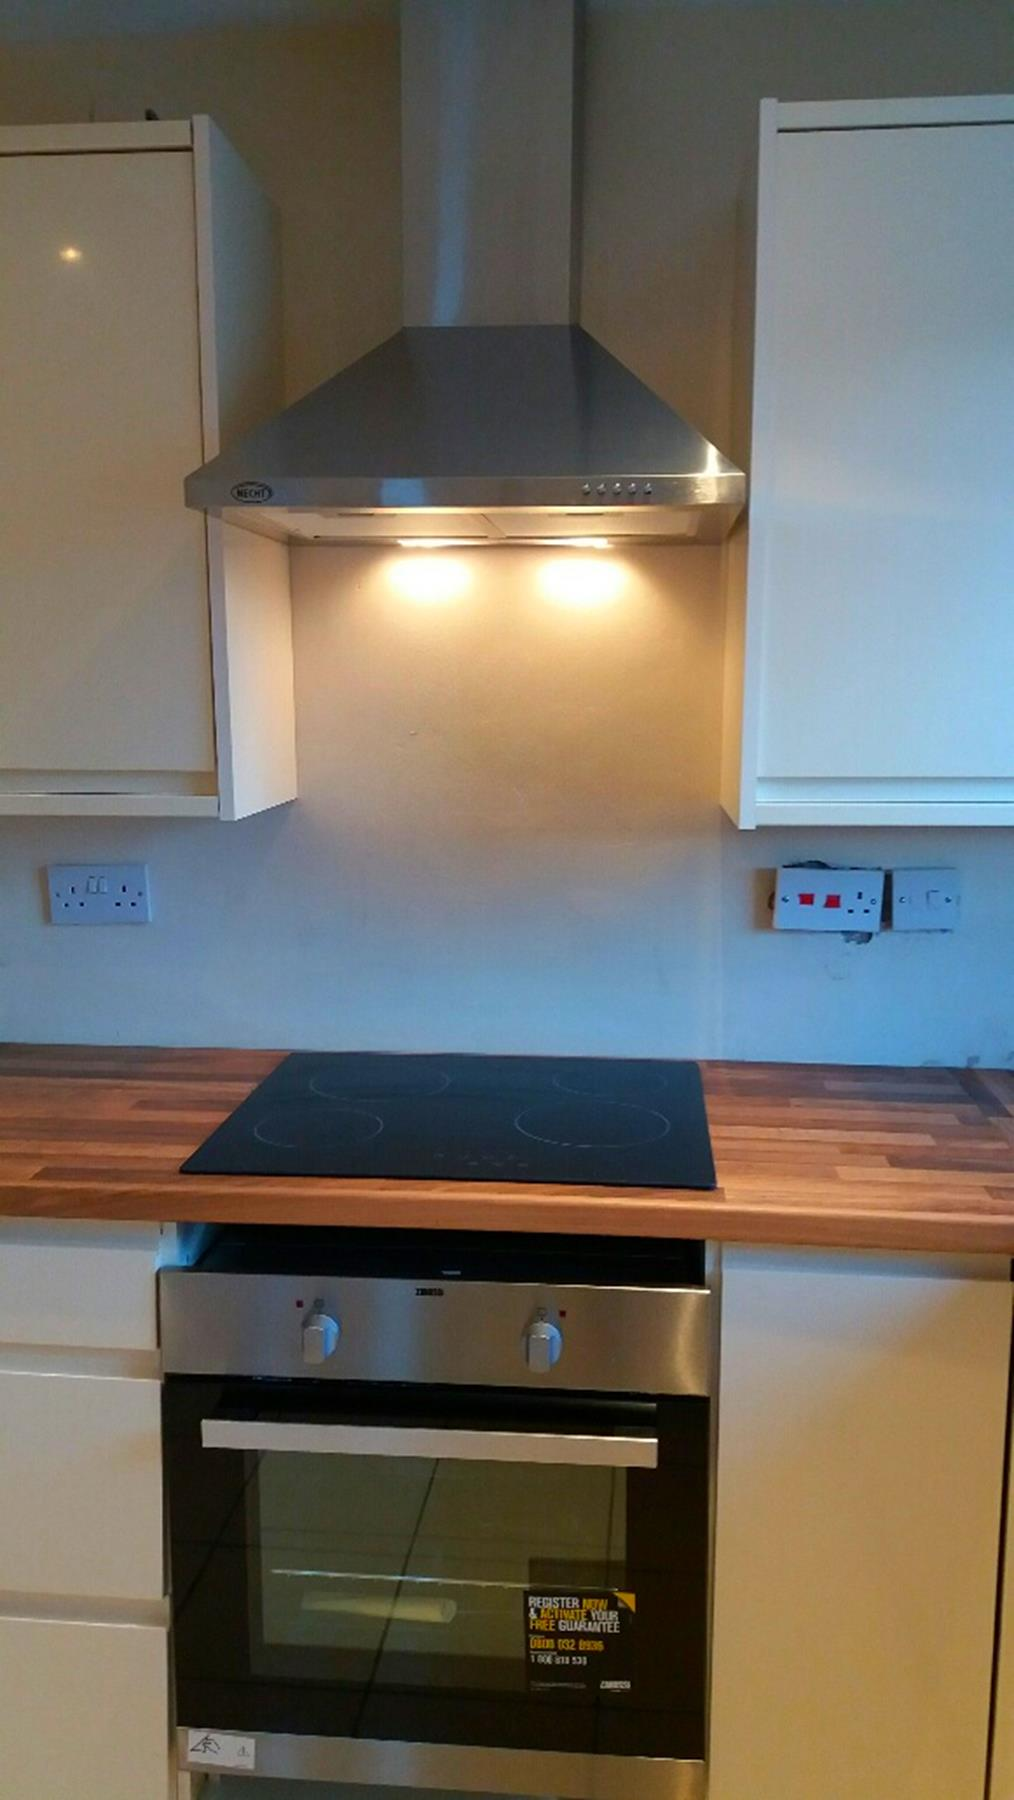 New Oven & Hob